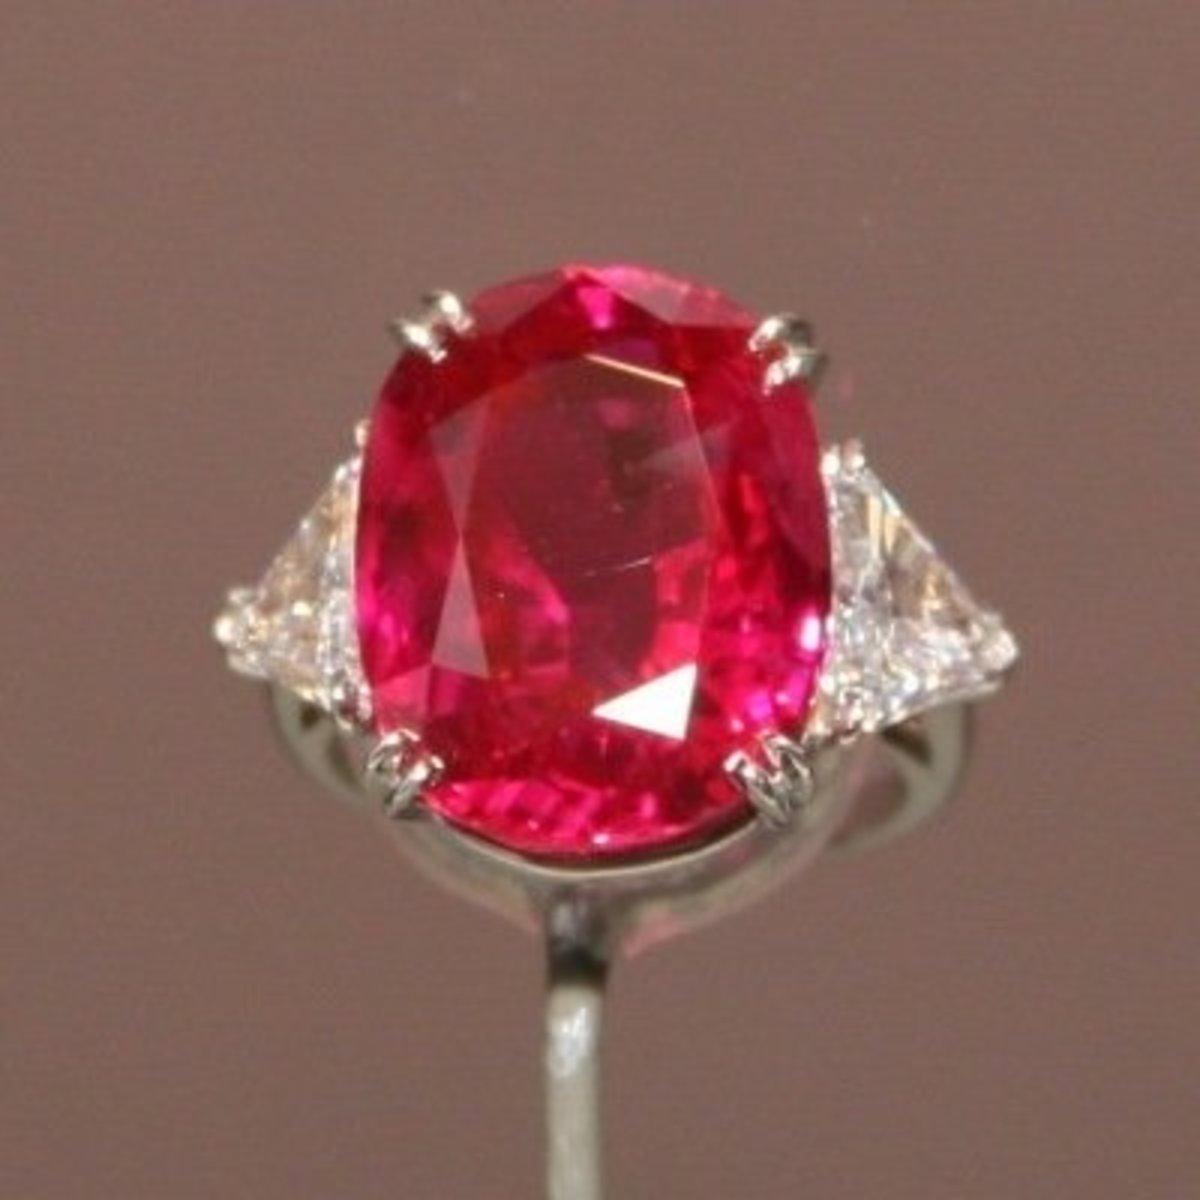 Pink Ruby Gemstones vs. Pink Sapphire Gems